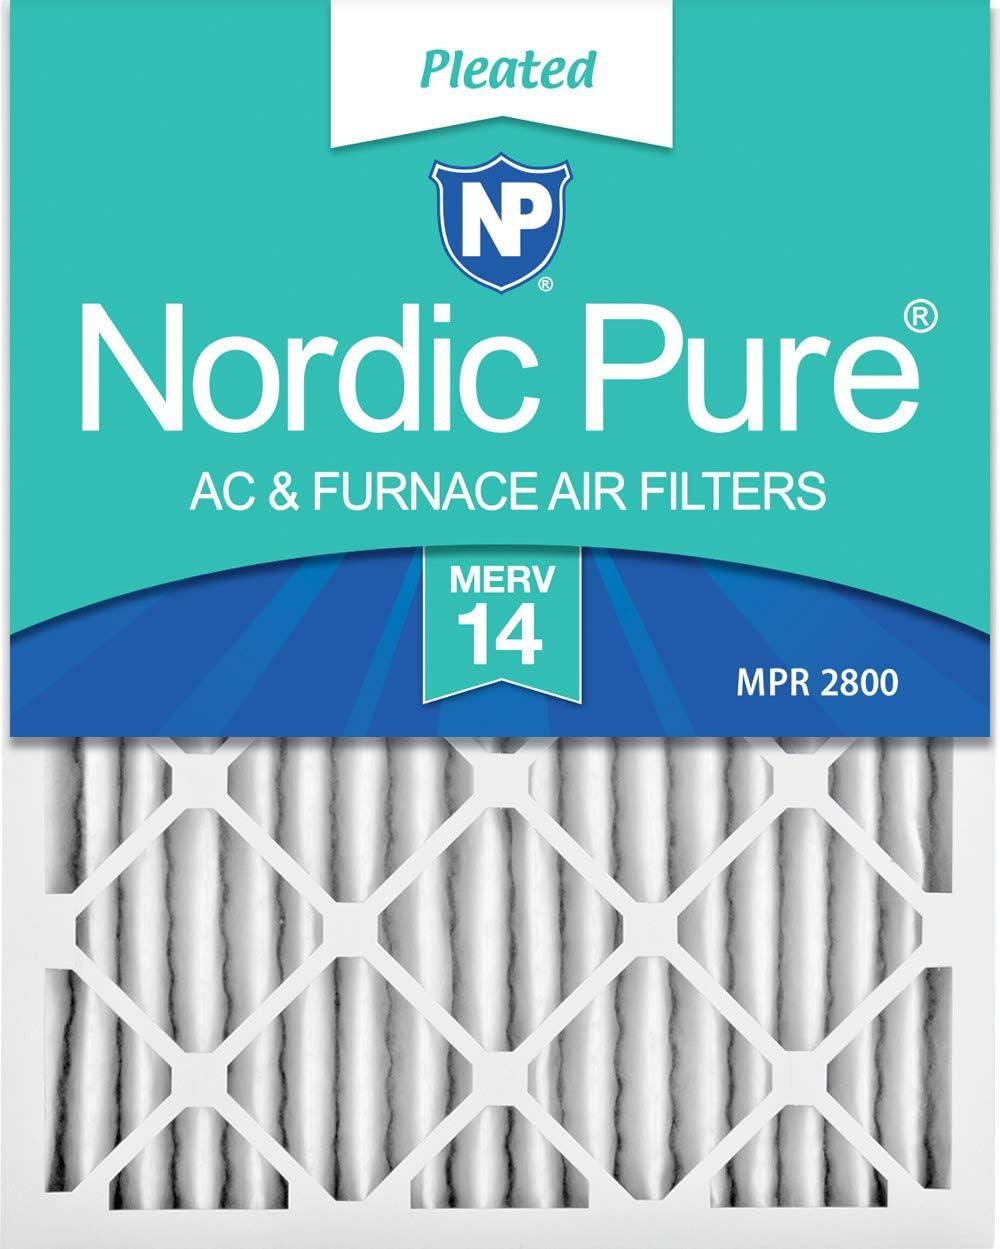 Nordic Pure 18x25x2 Super sale period limited MERV 13 Pleated Filters Award 3 Furnace AC Pac Air